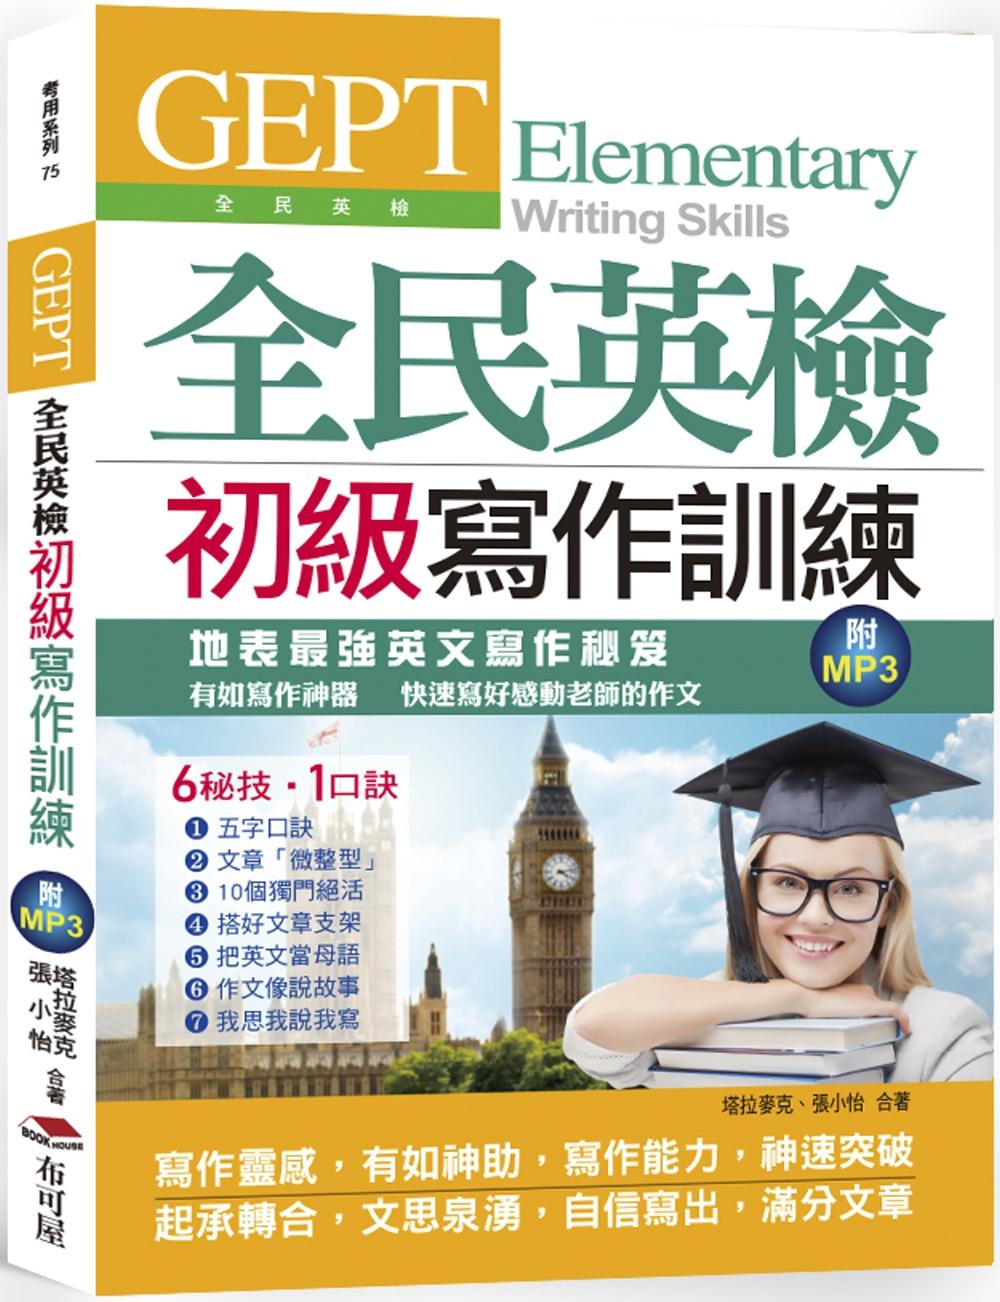 GEPT全民英檢初級寫作訓練:地表最強英文寫作秘笈,快速寫好感動老師的英文作文(附MP3)